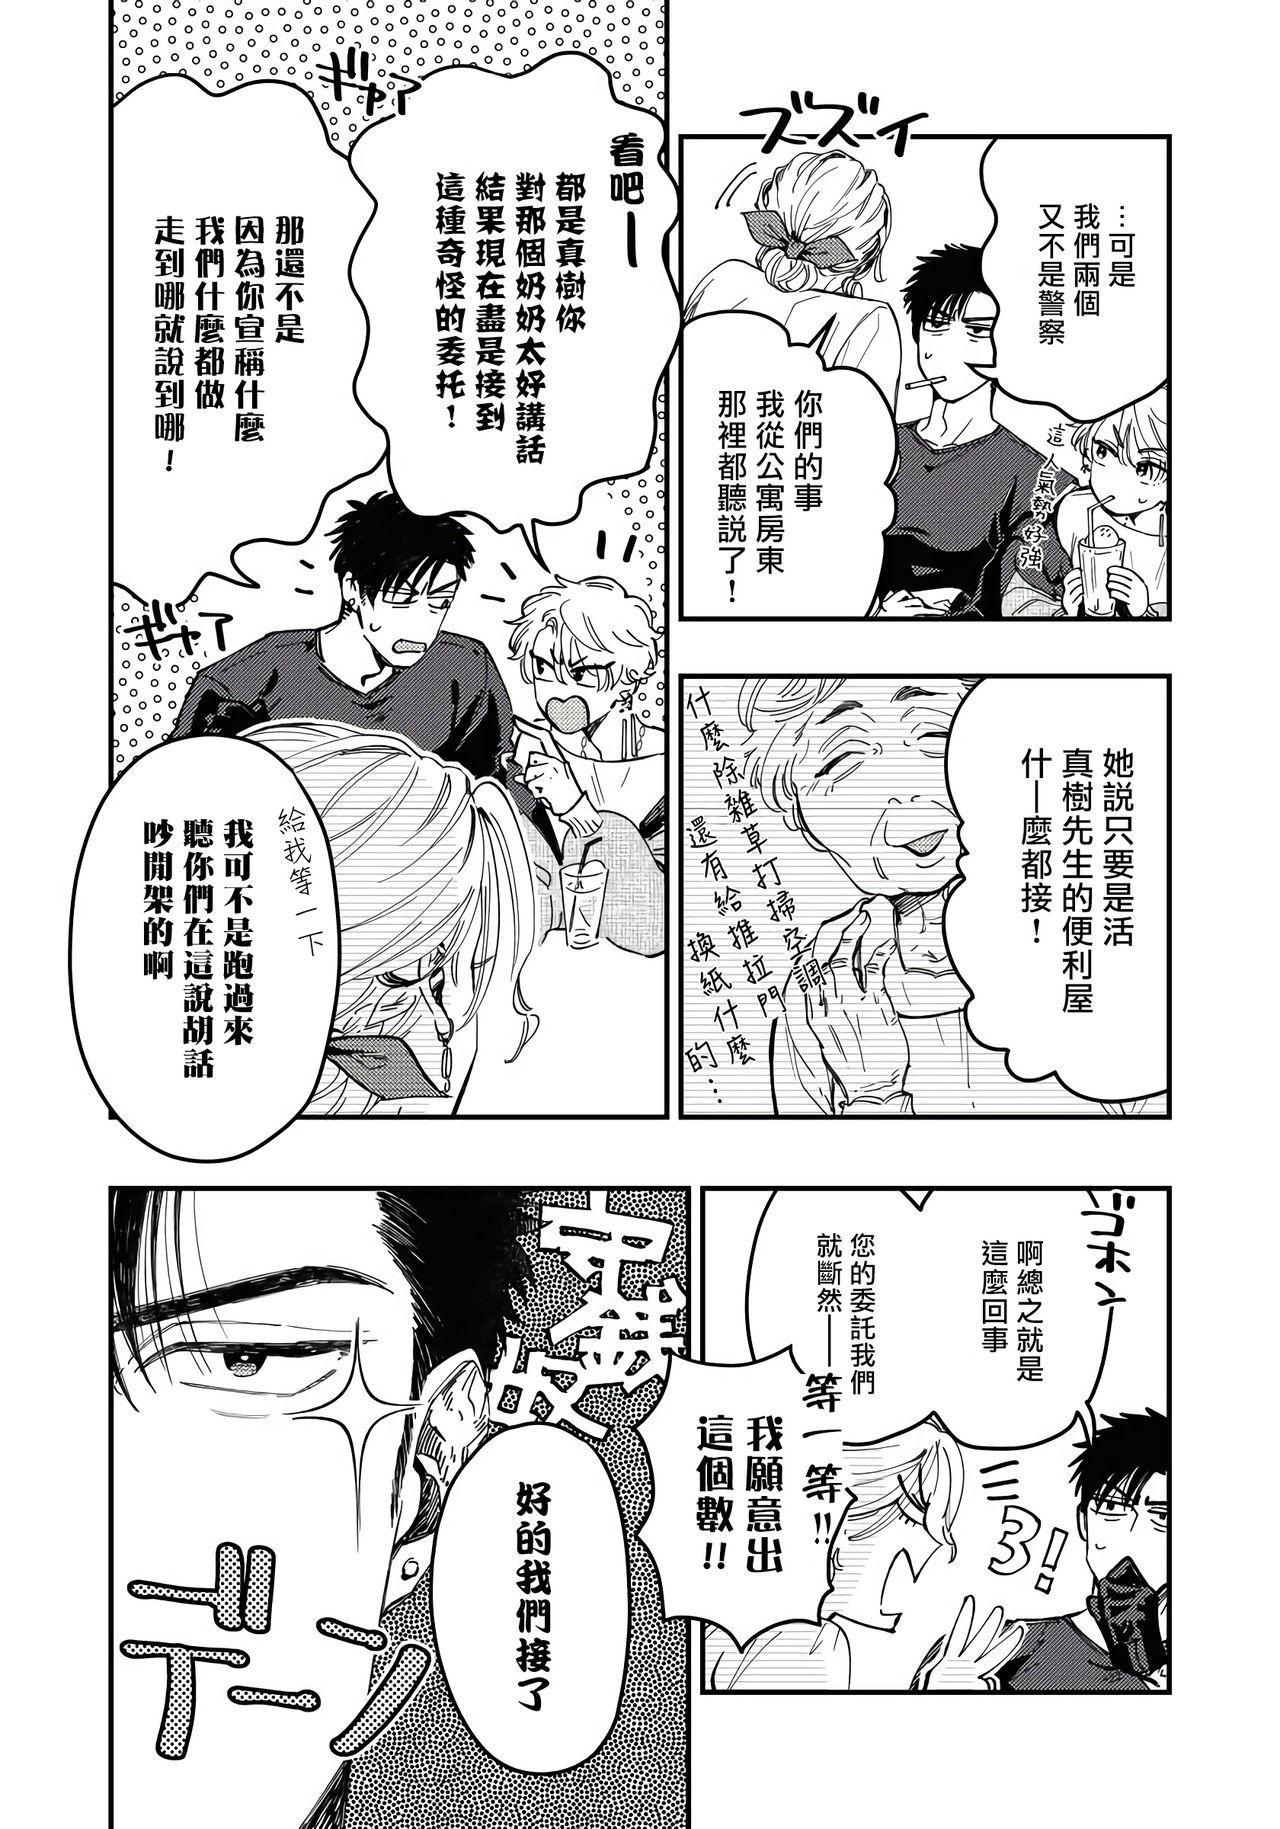 Kokomade Yarutoha Kiitenai! |之前可没听说要做到这个份上啊! 1-3 5